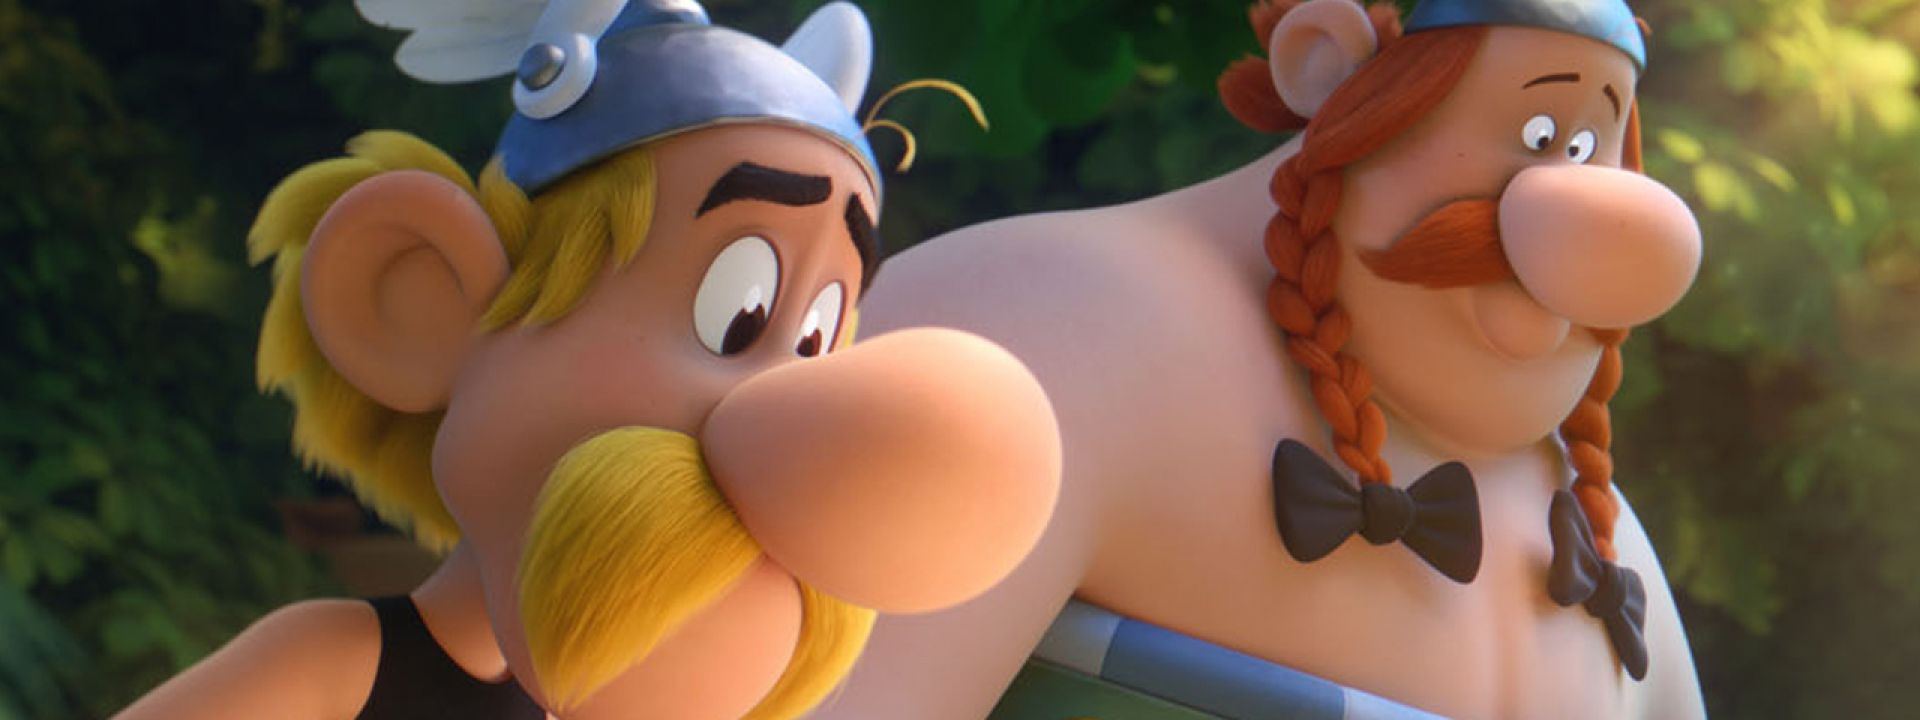 Park Your Cinema Kids - Asterix: The Secret of the Magic Potion (2018) - Εικόνα